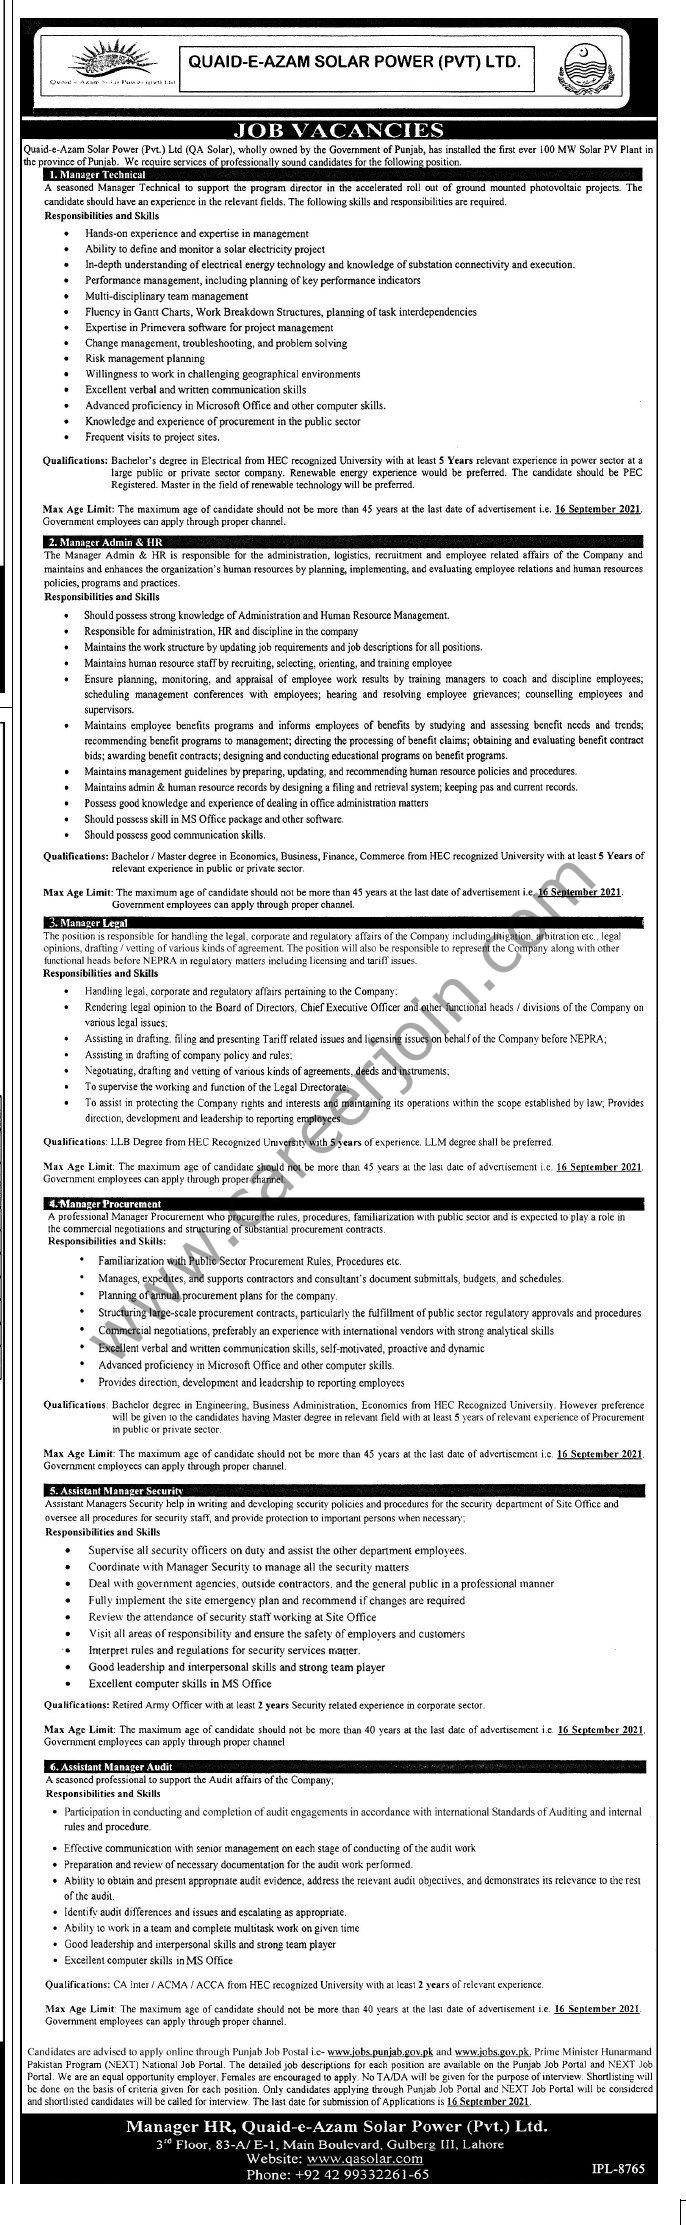 Quaid-e-Azam Solar Power Pvt Ltd Jobs SEP 2021